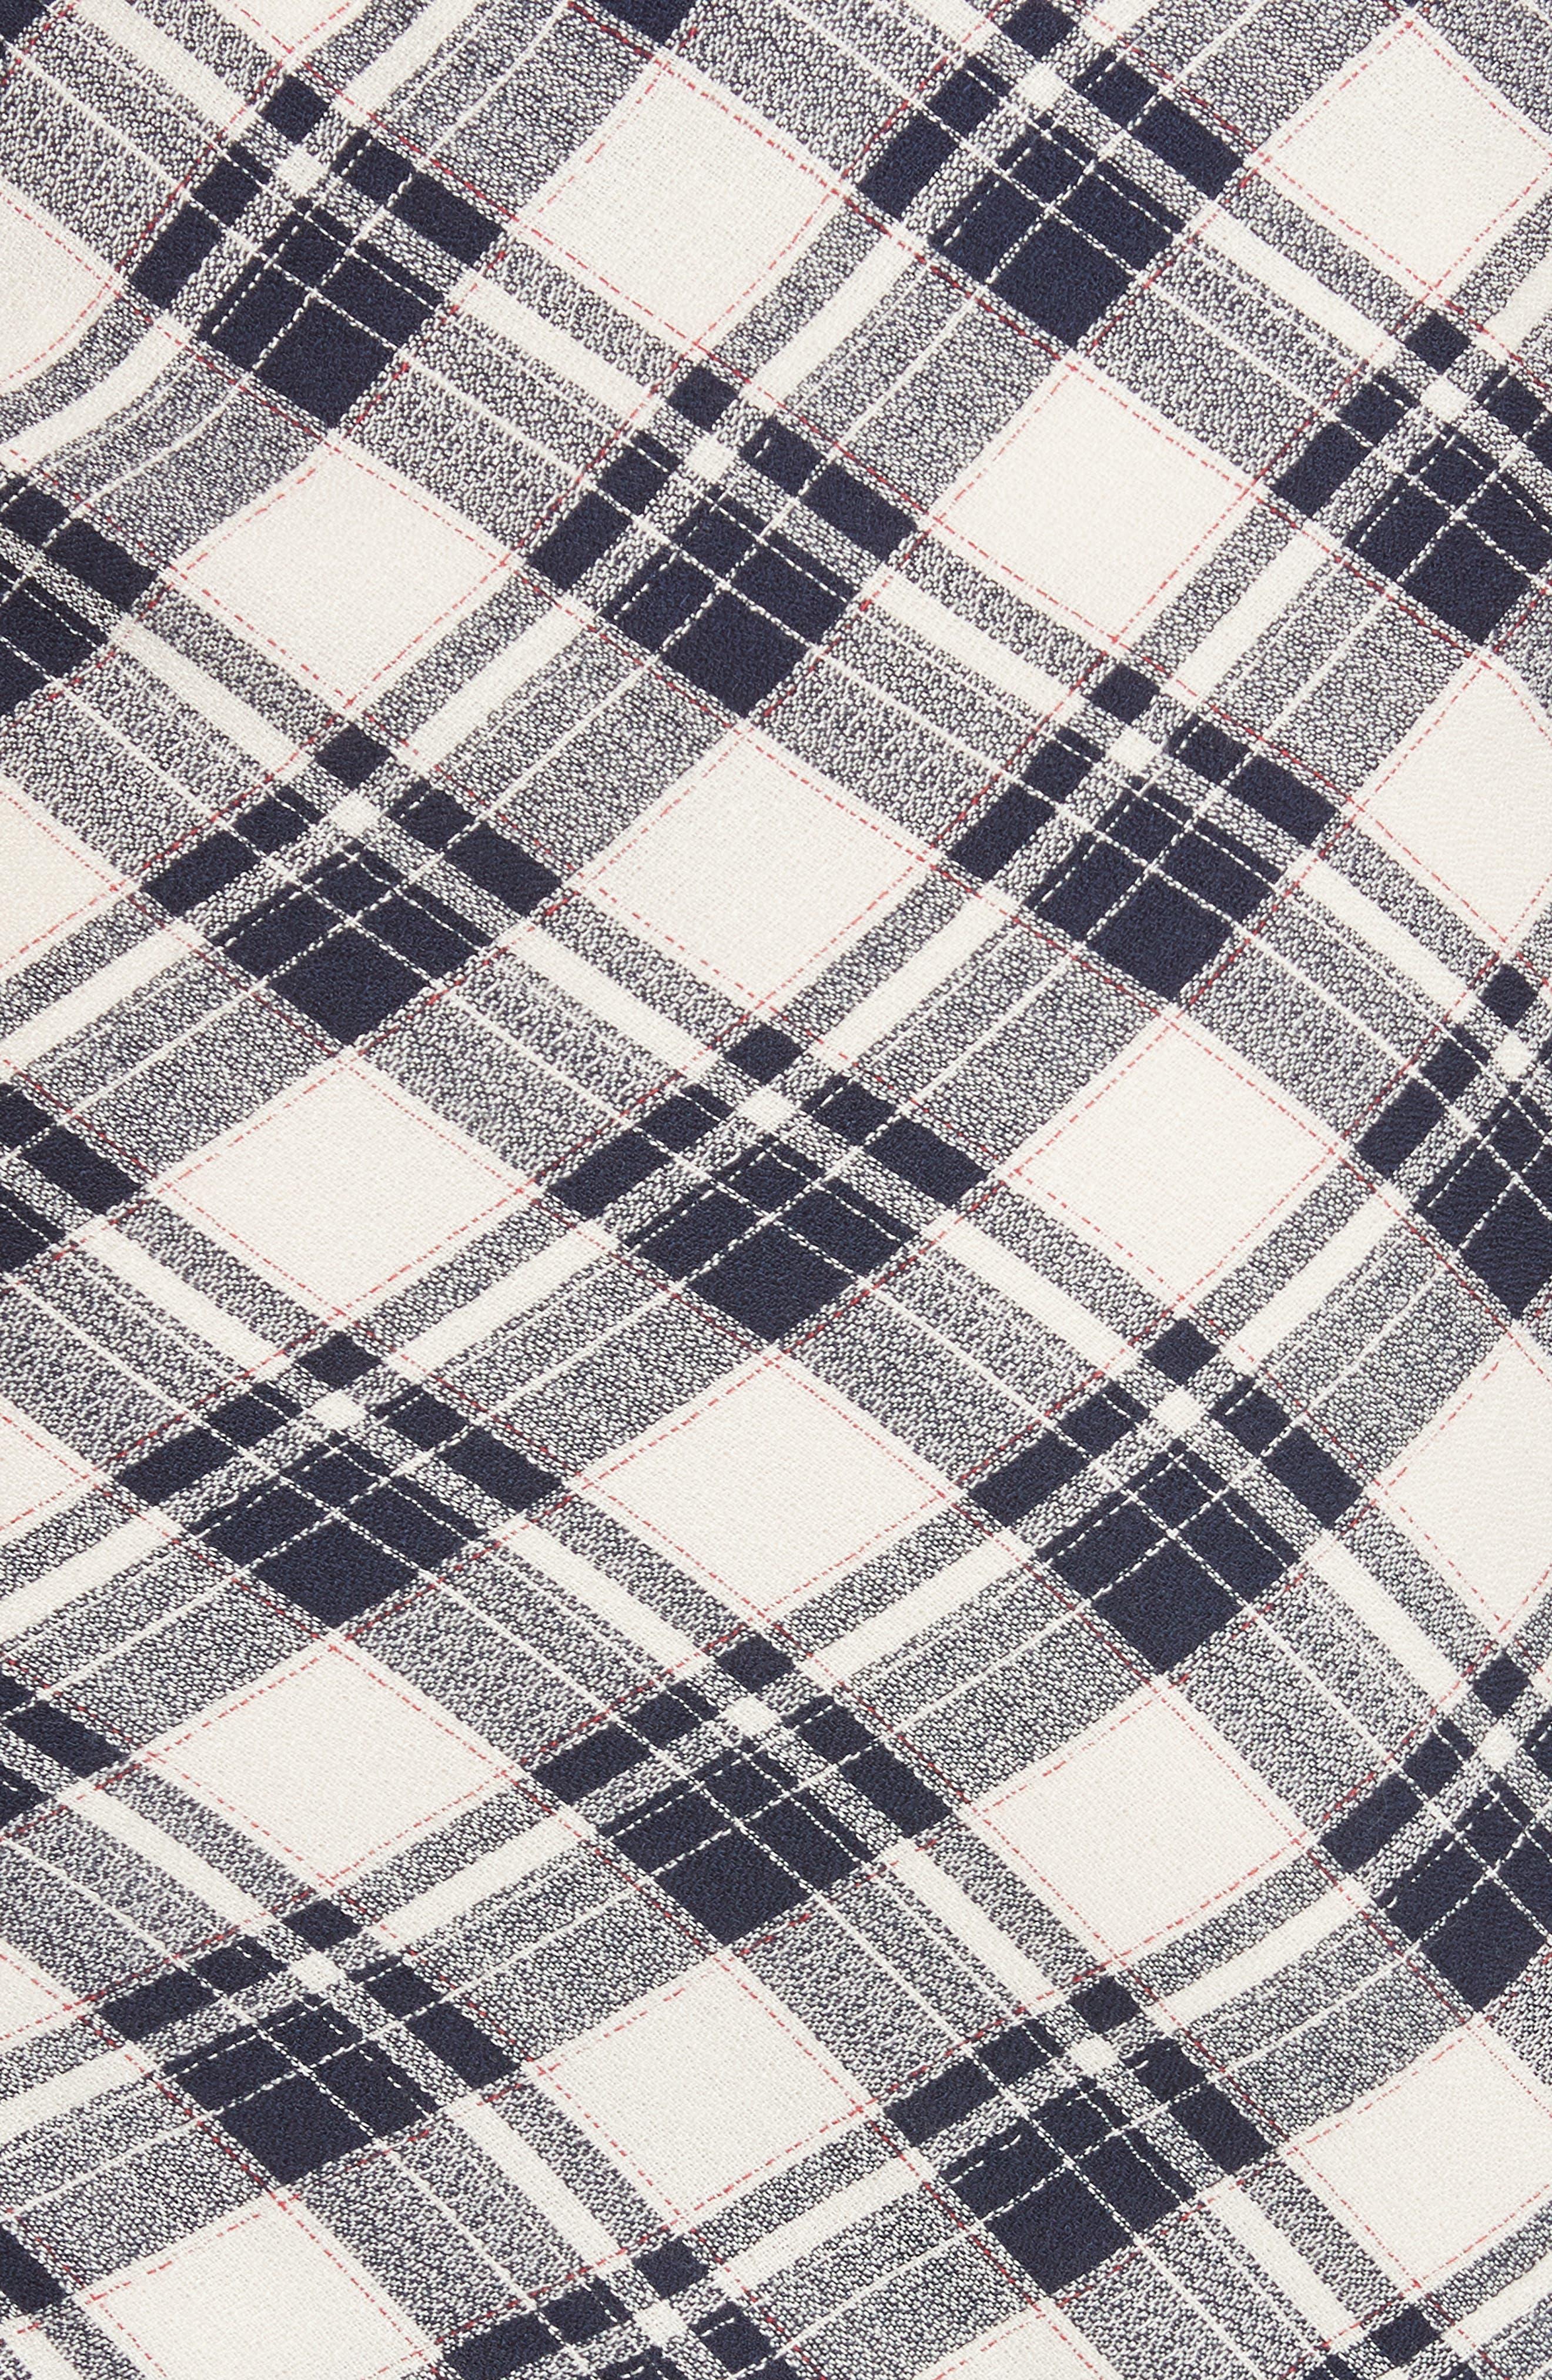 Murphy Ruched Miniskirt,                             Alternate thumbnail 5, color,                             NAVY/ ECRU